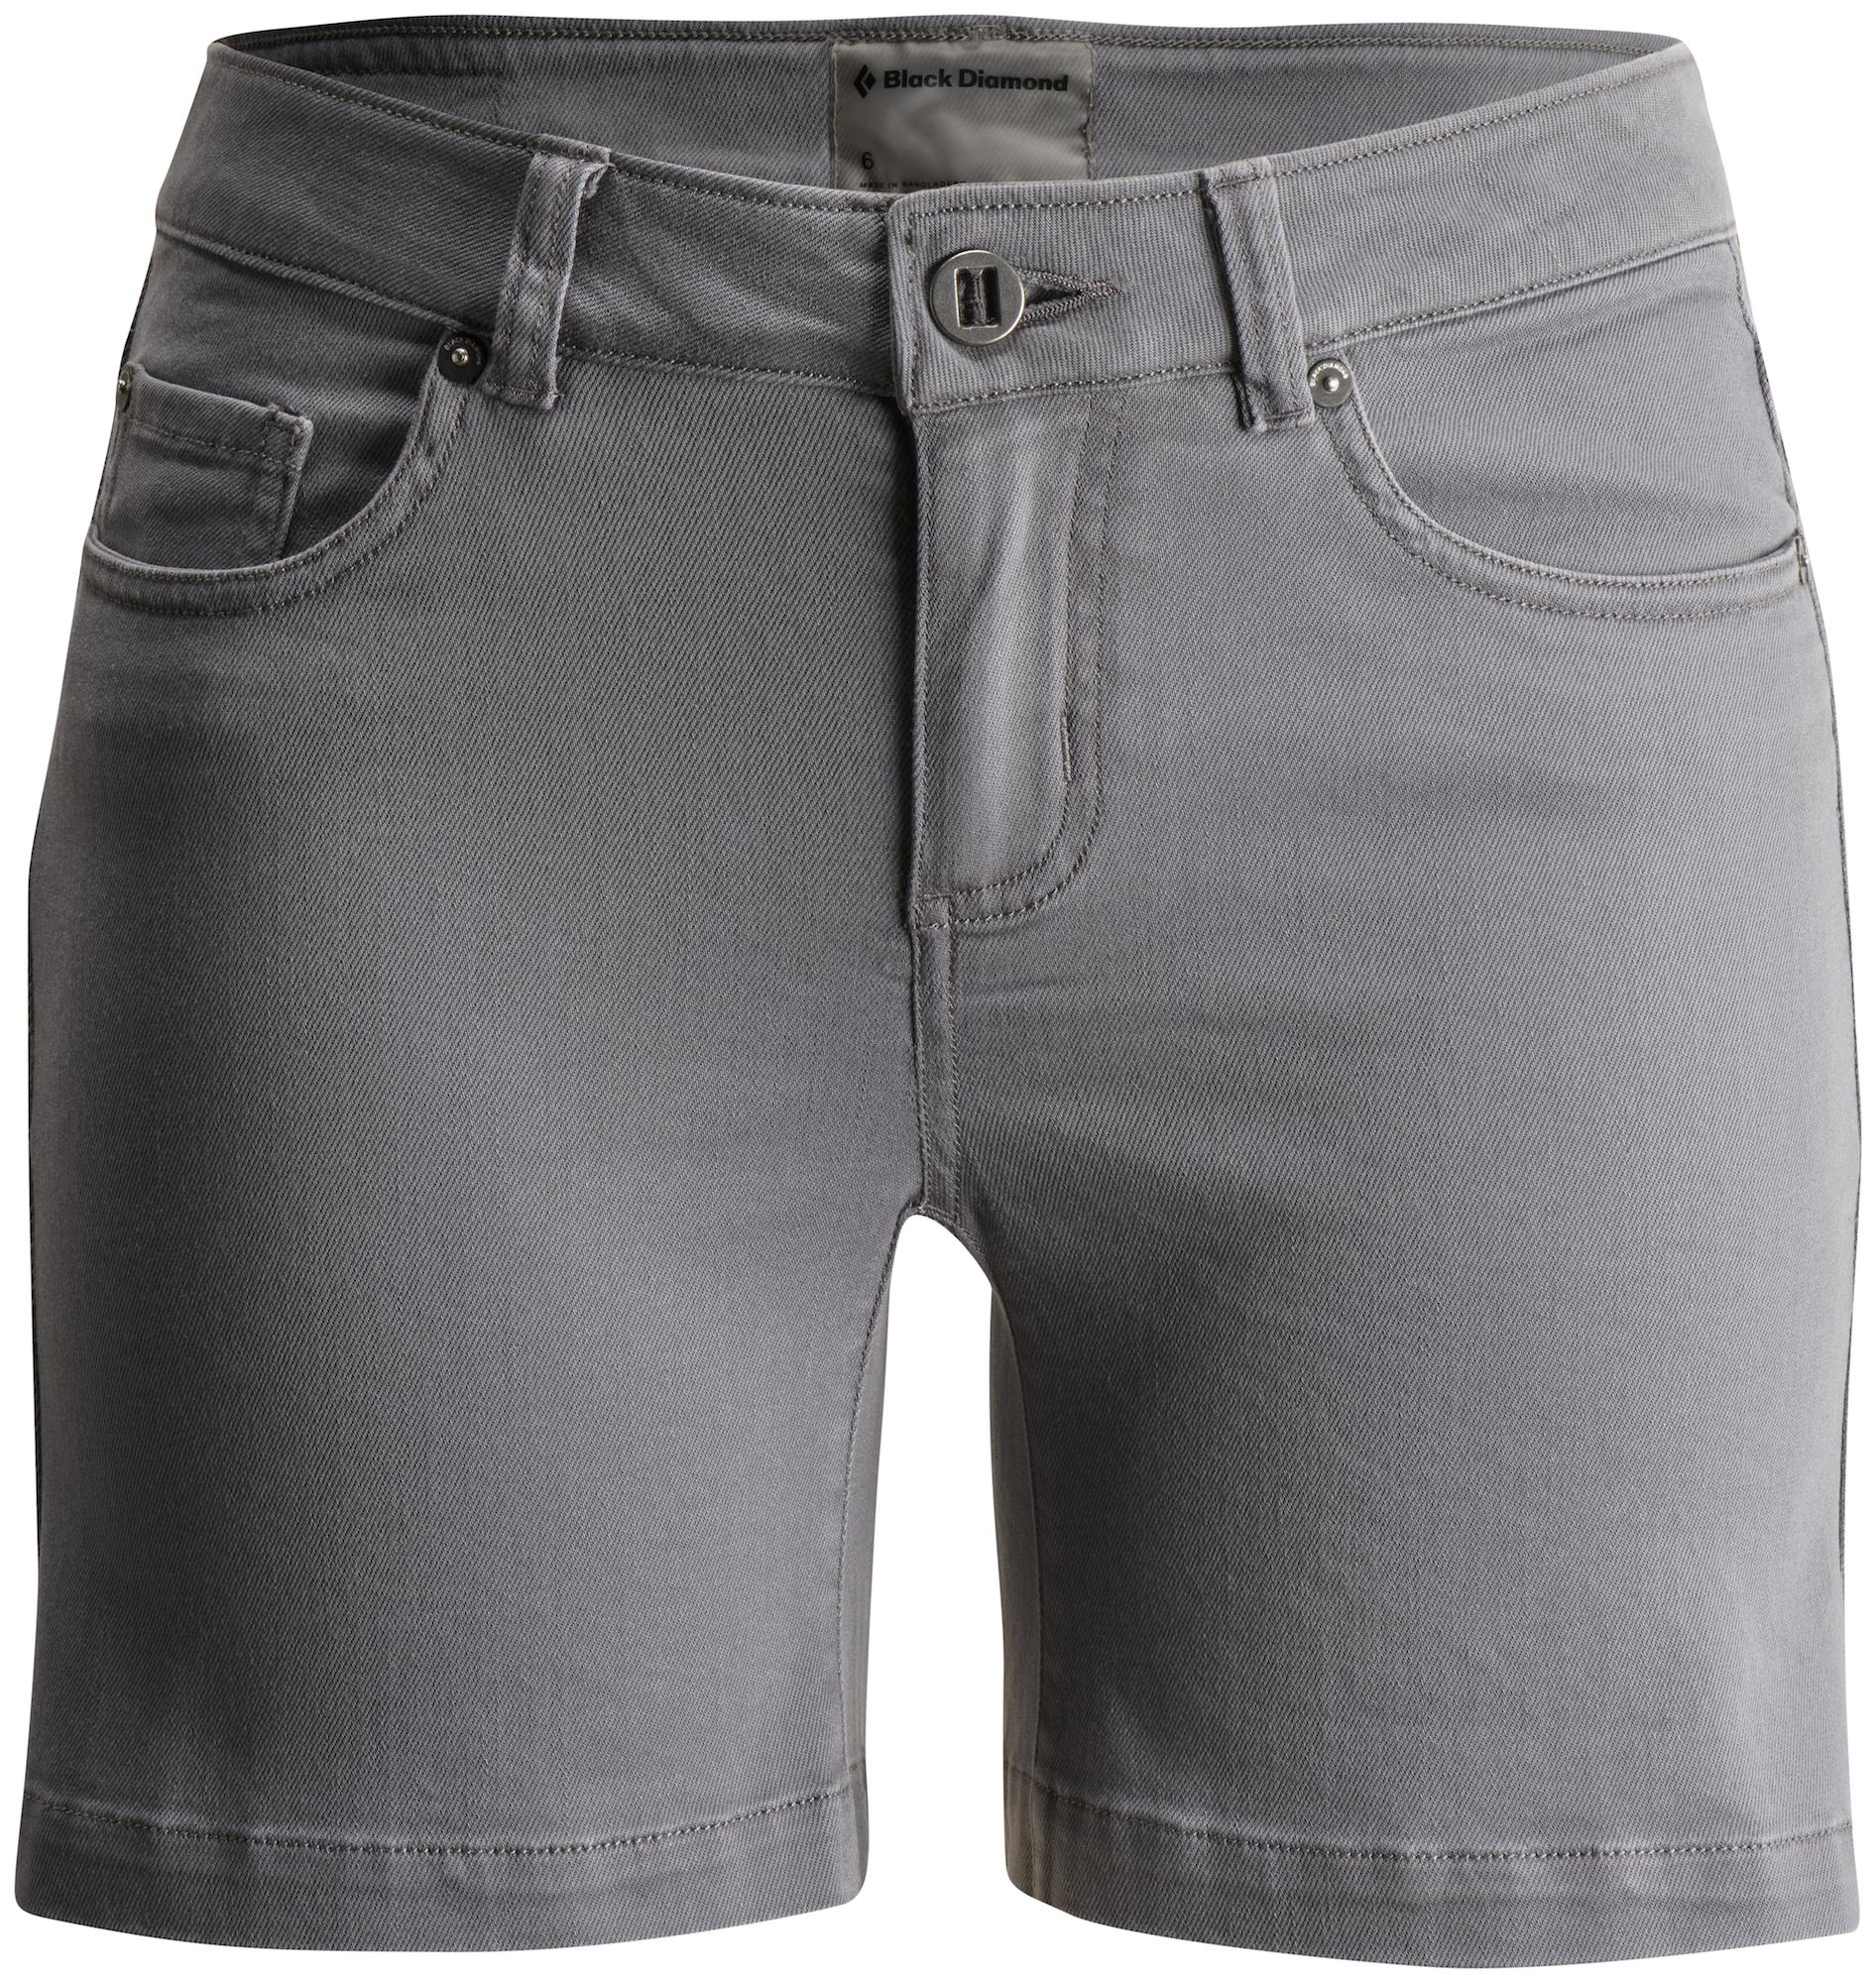 Black Diamond Stretch Font Shorts - Klettershorts - Damen